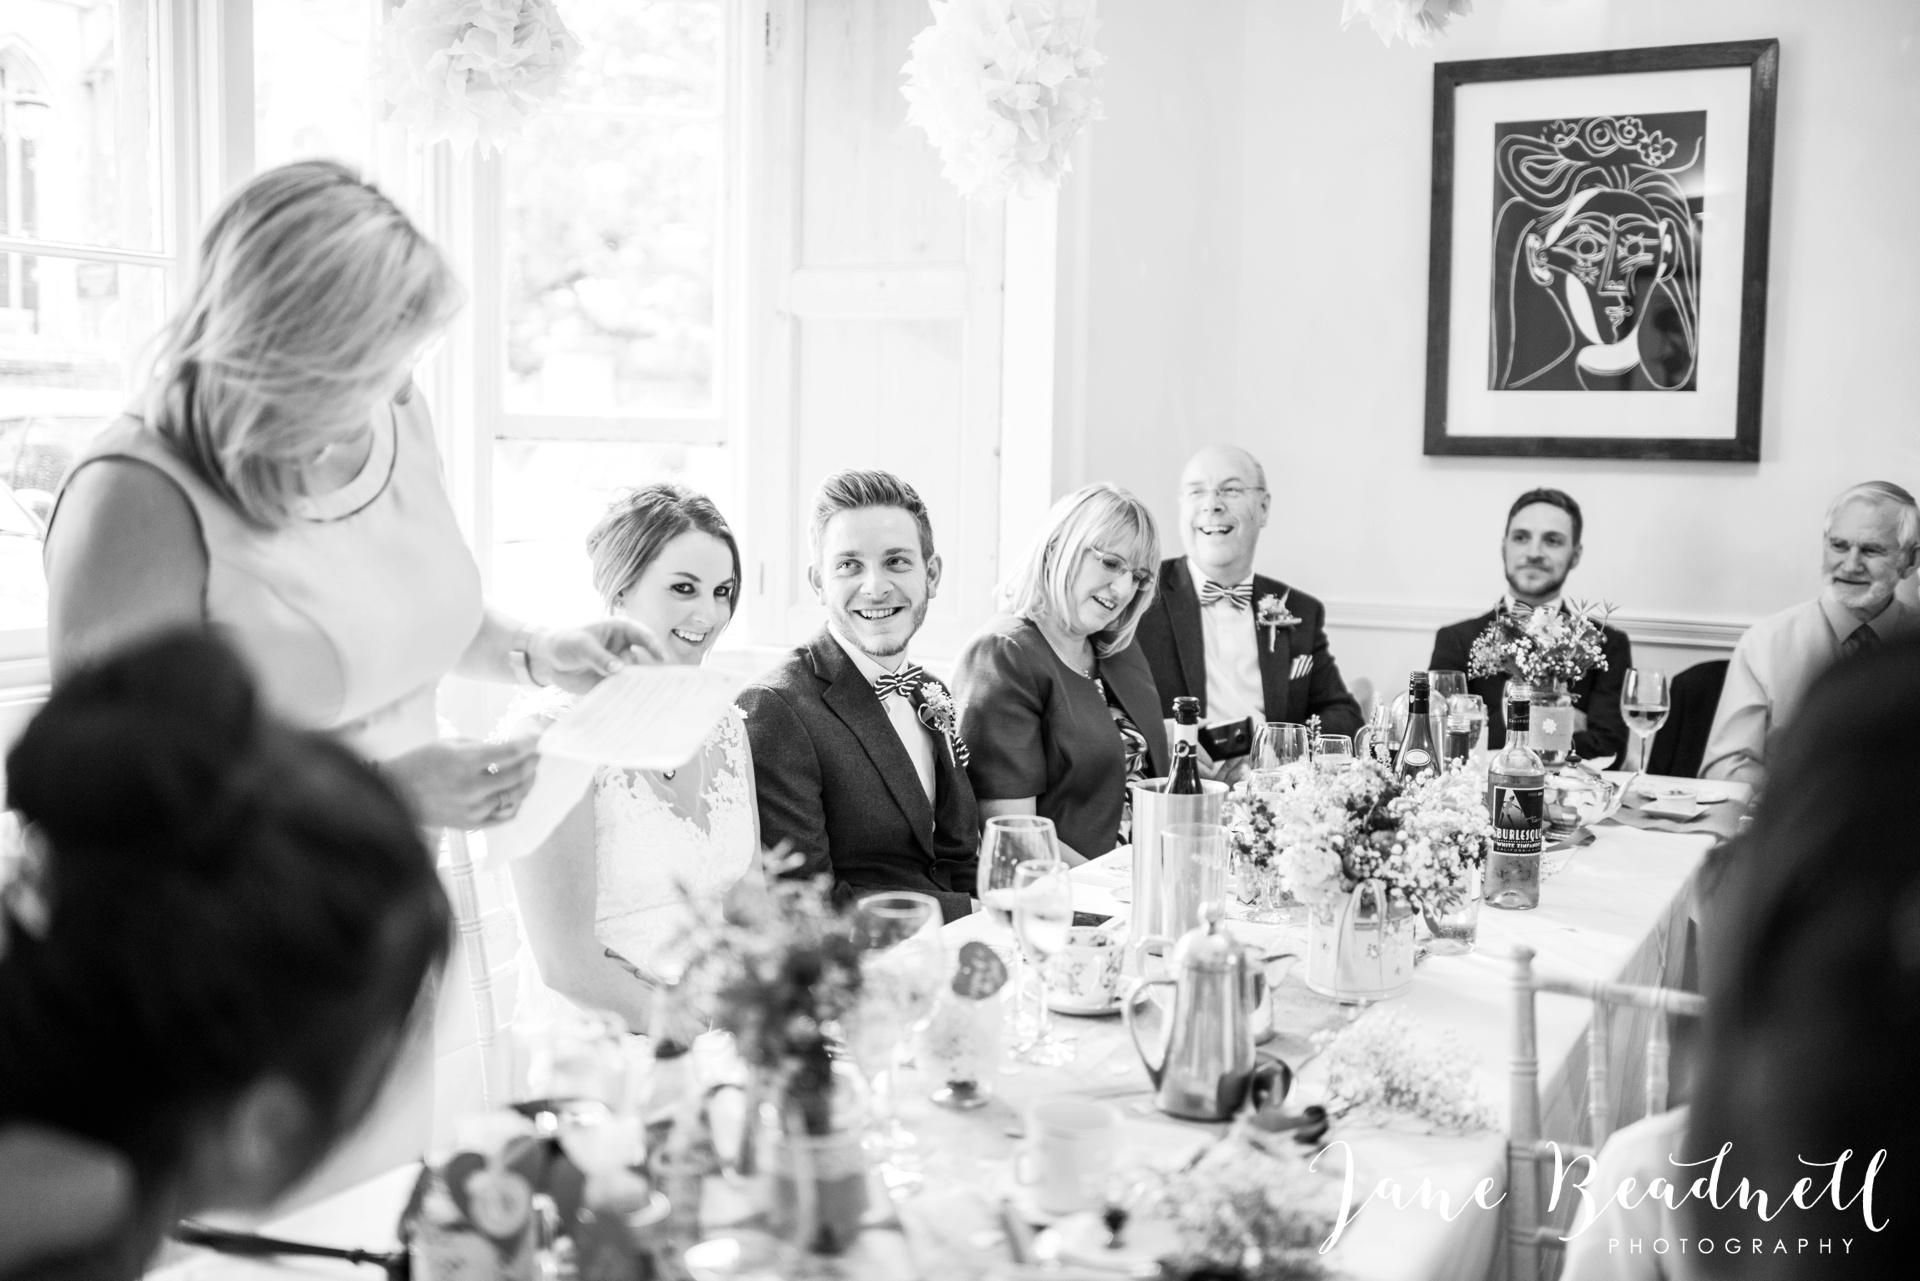 Jane Beadnell fine art wedding photographer The Old Deanery Ripon_0060